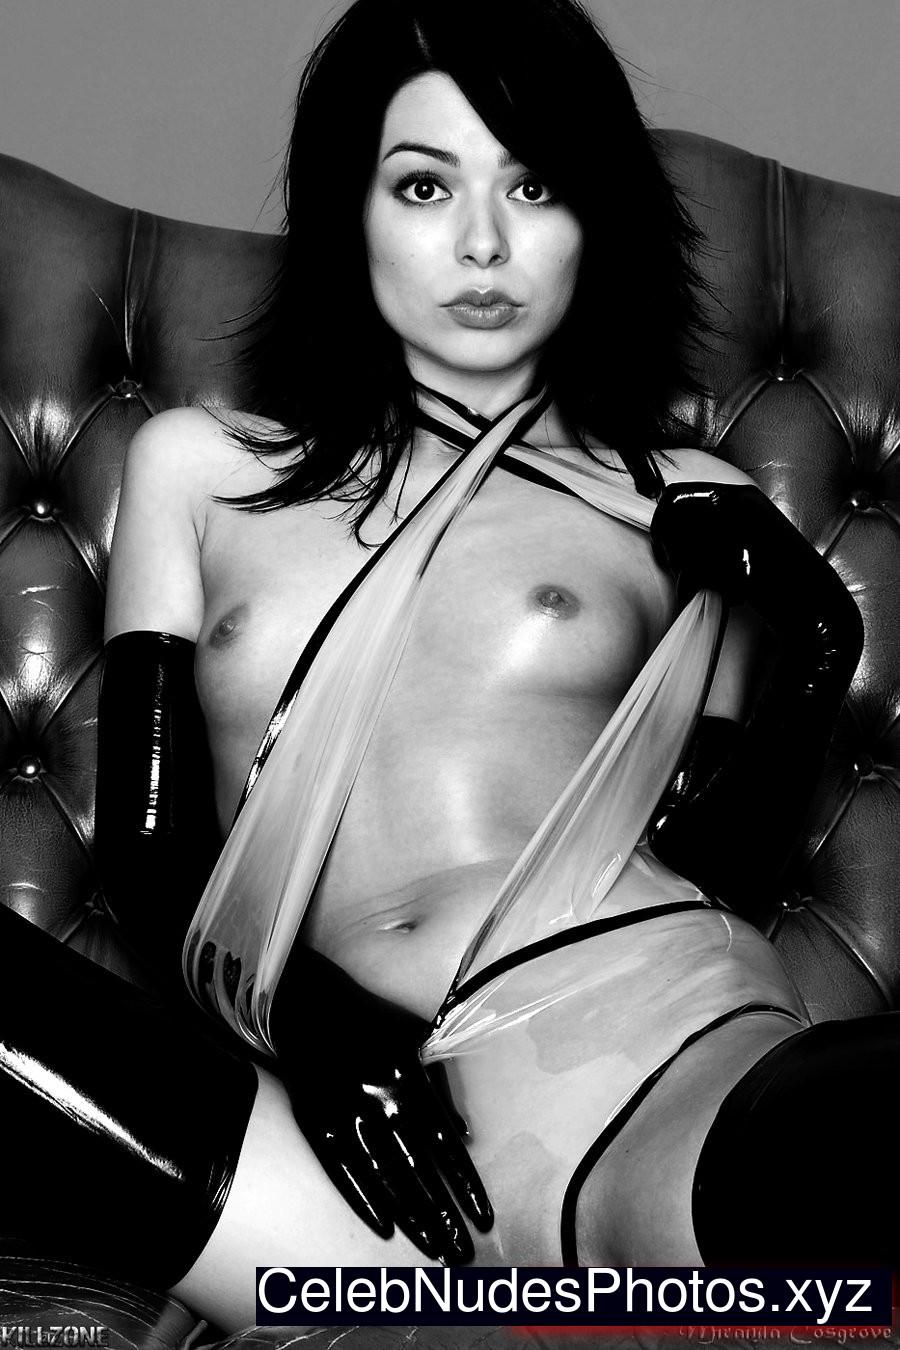 sexiest nudes of miranda cosgrove